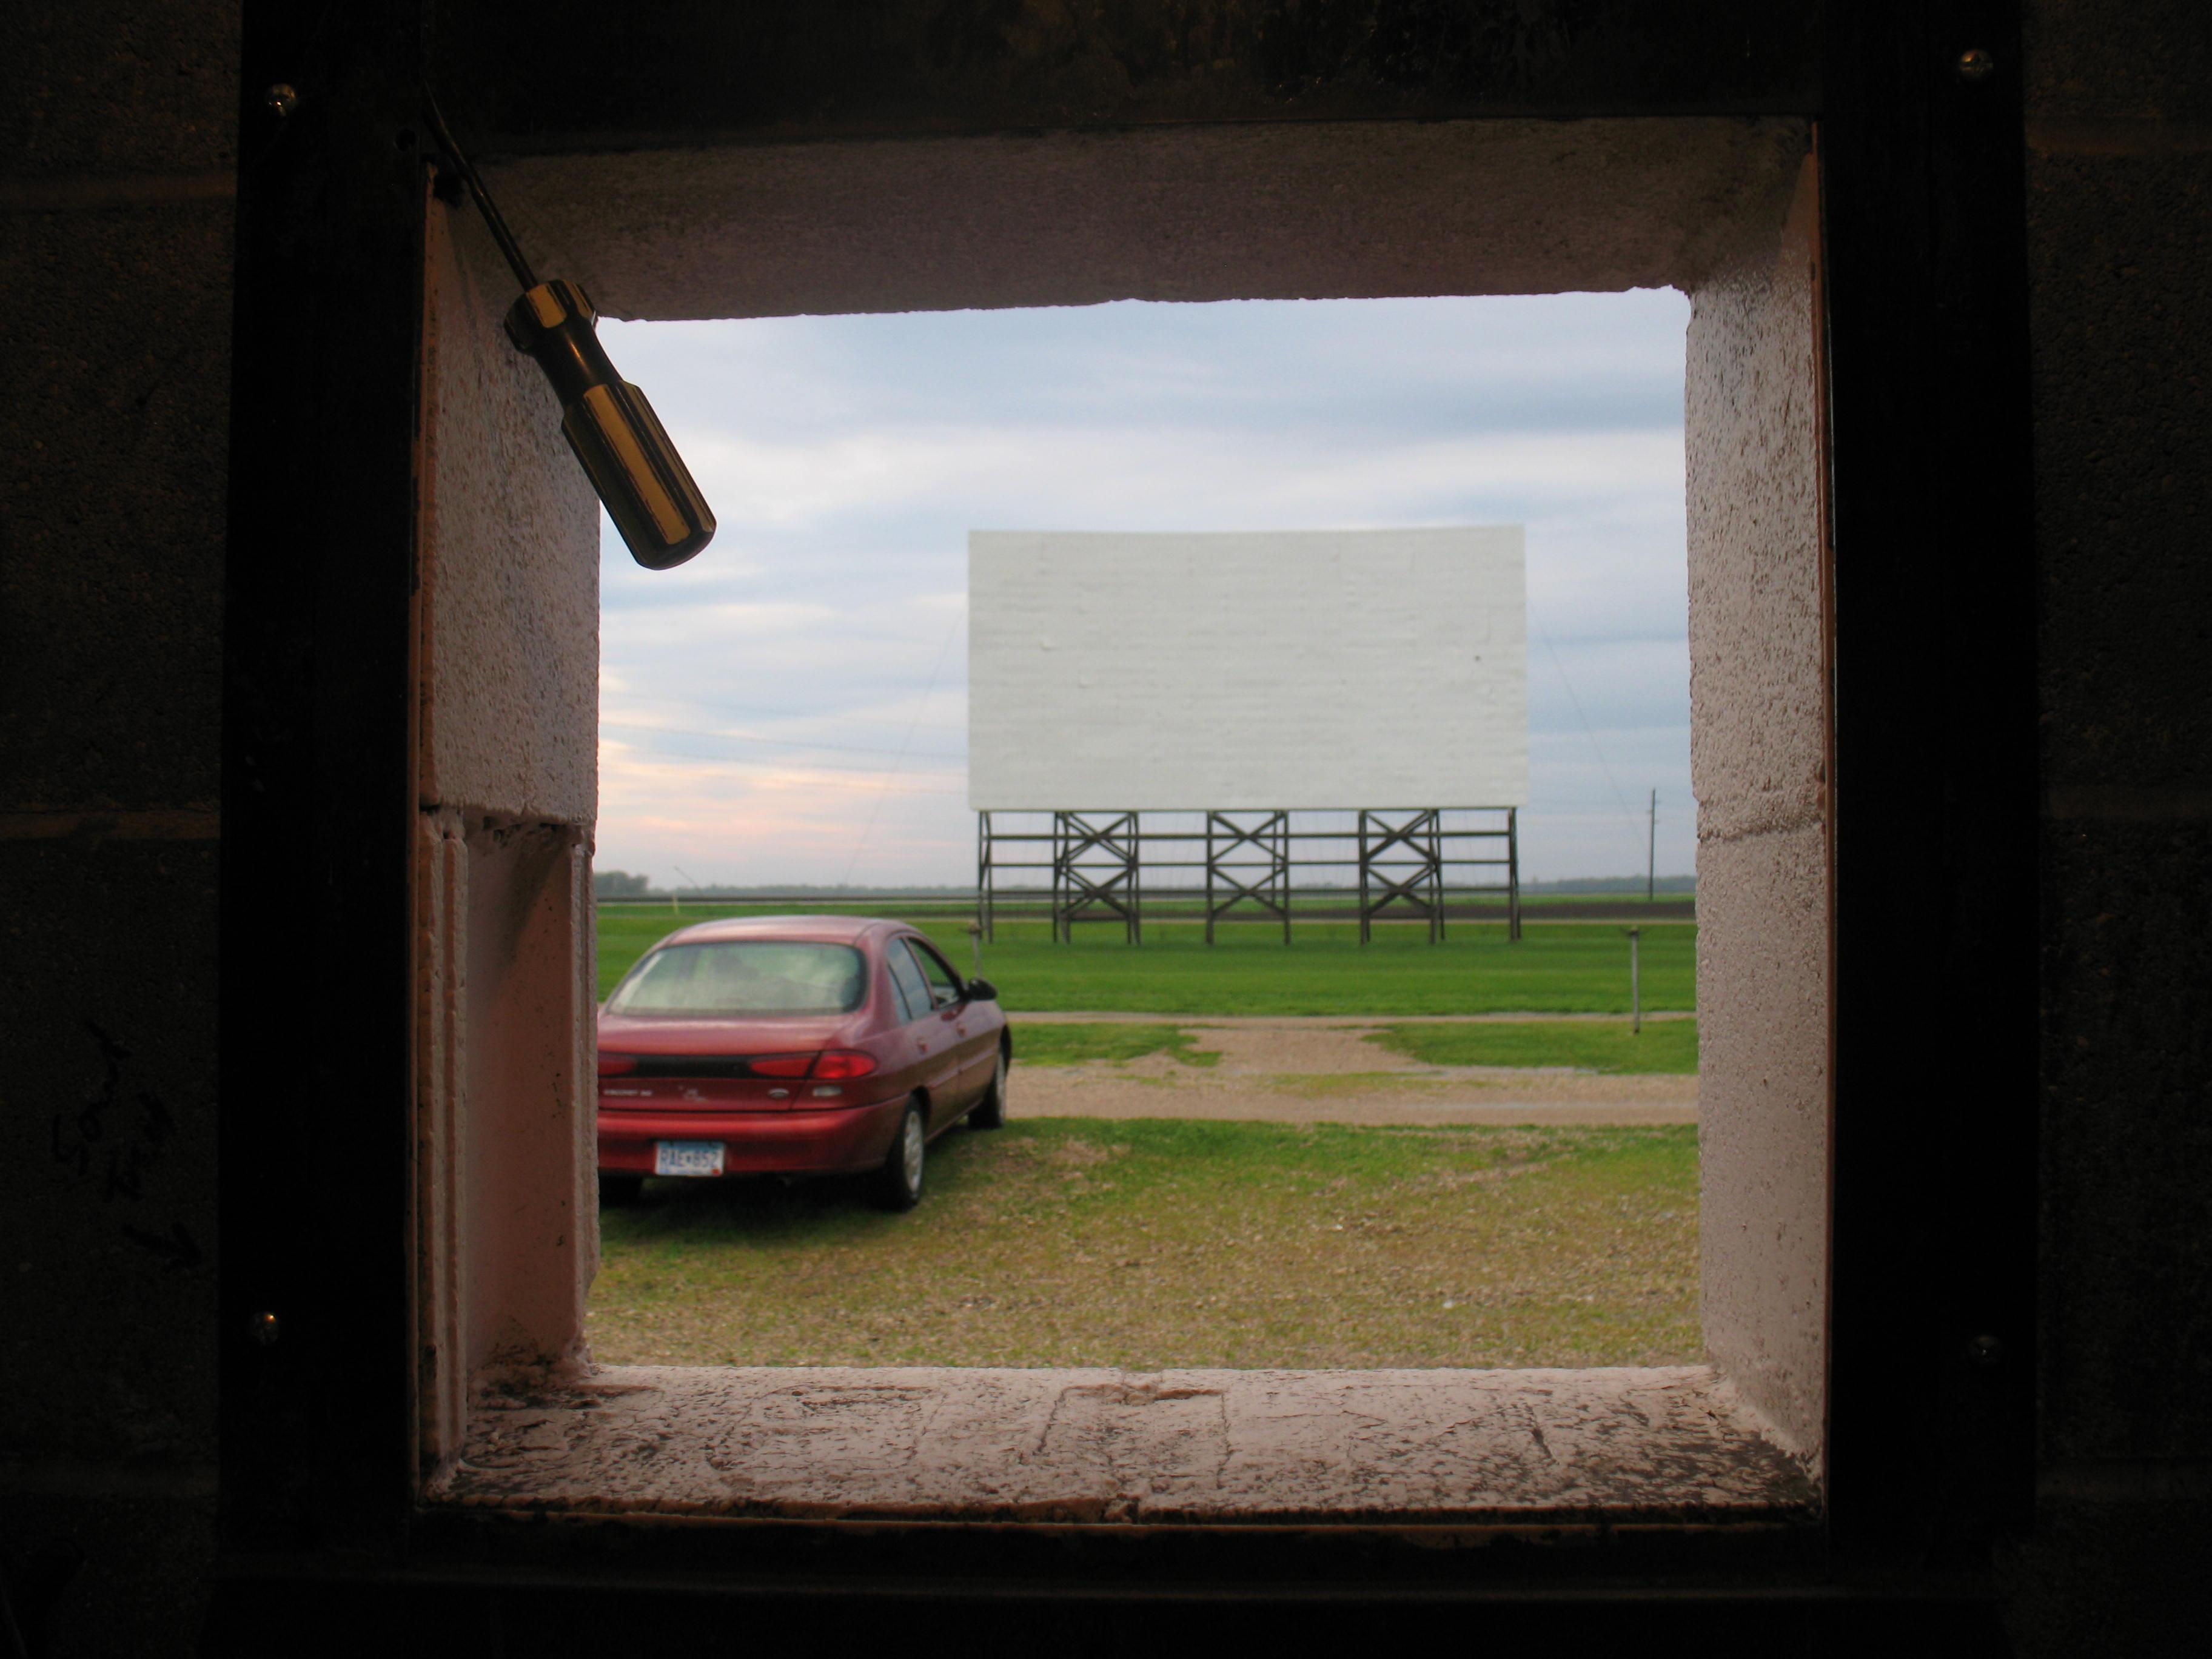 Warren Drive Mn In Movie Theater